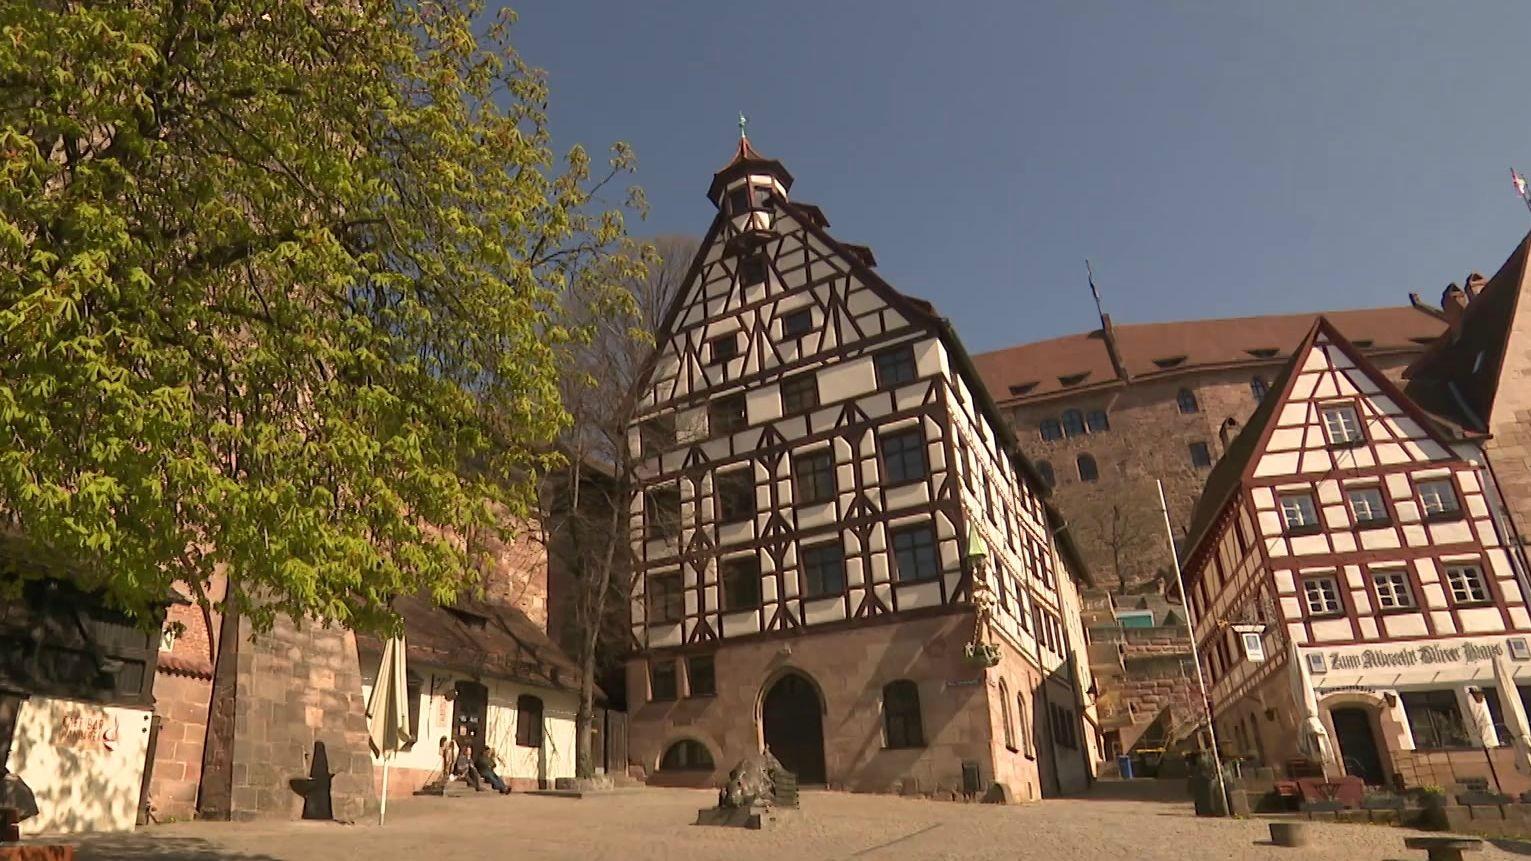 Pilatushaus am Nürnberger Tiergärtnertorplatz